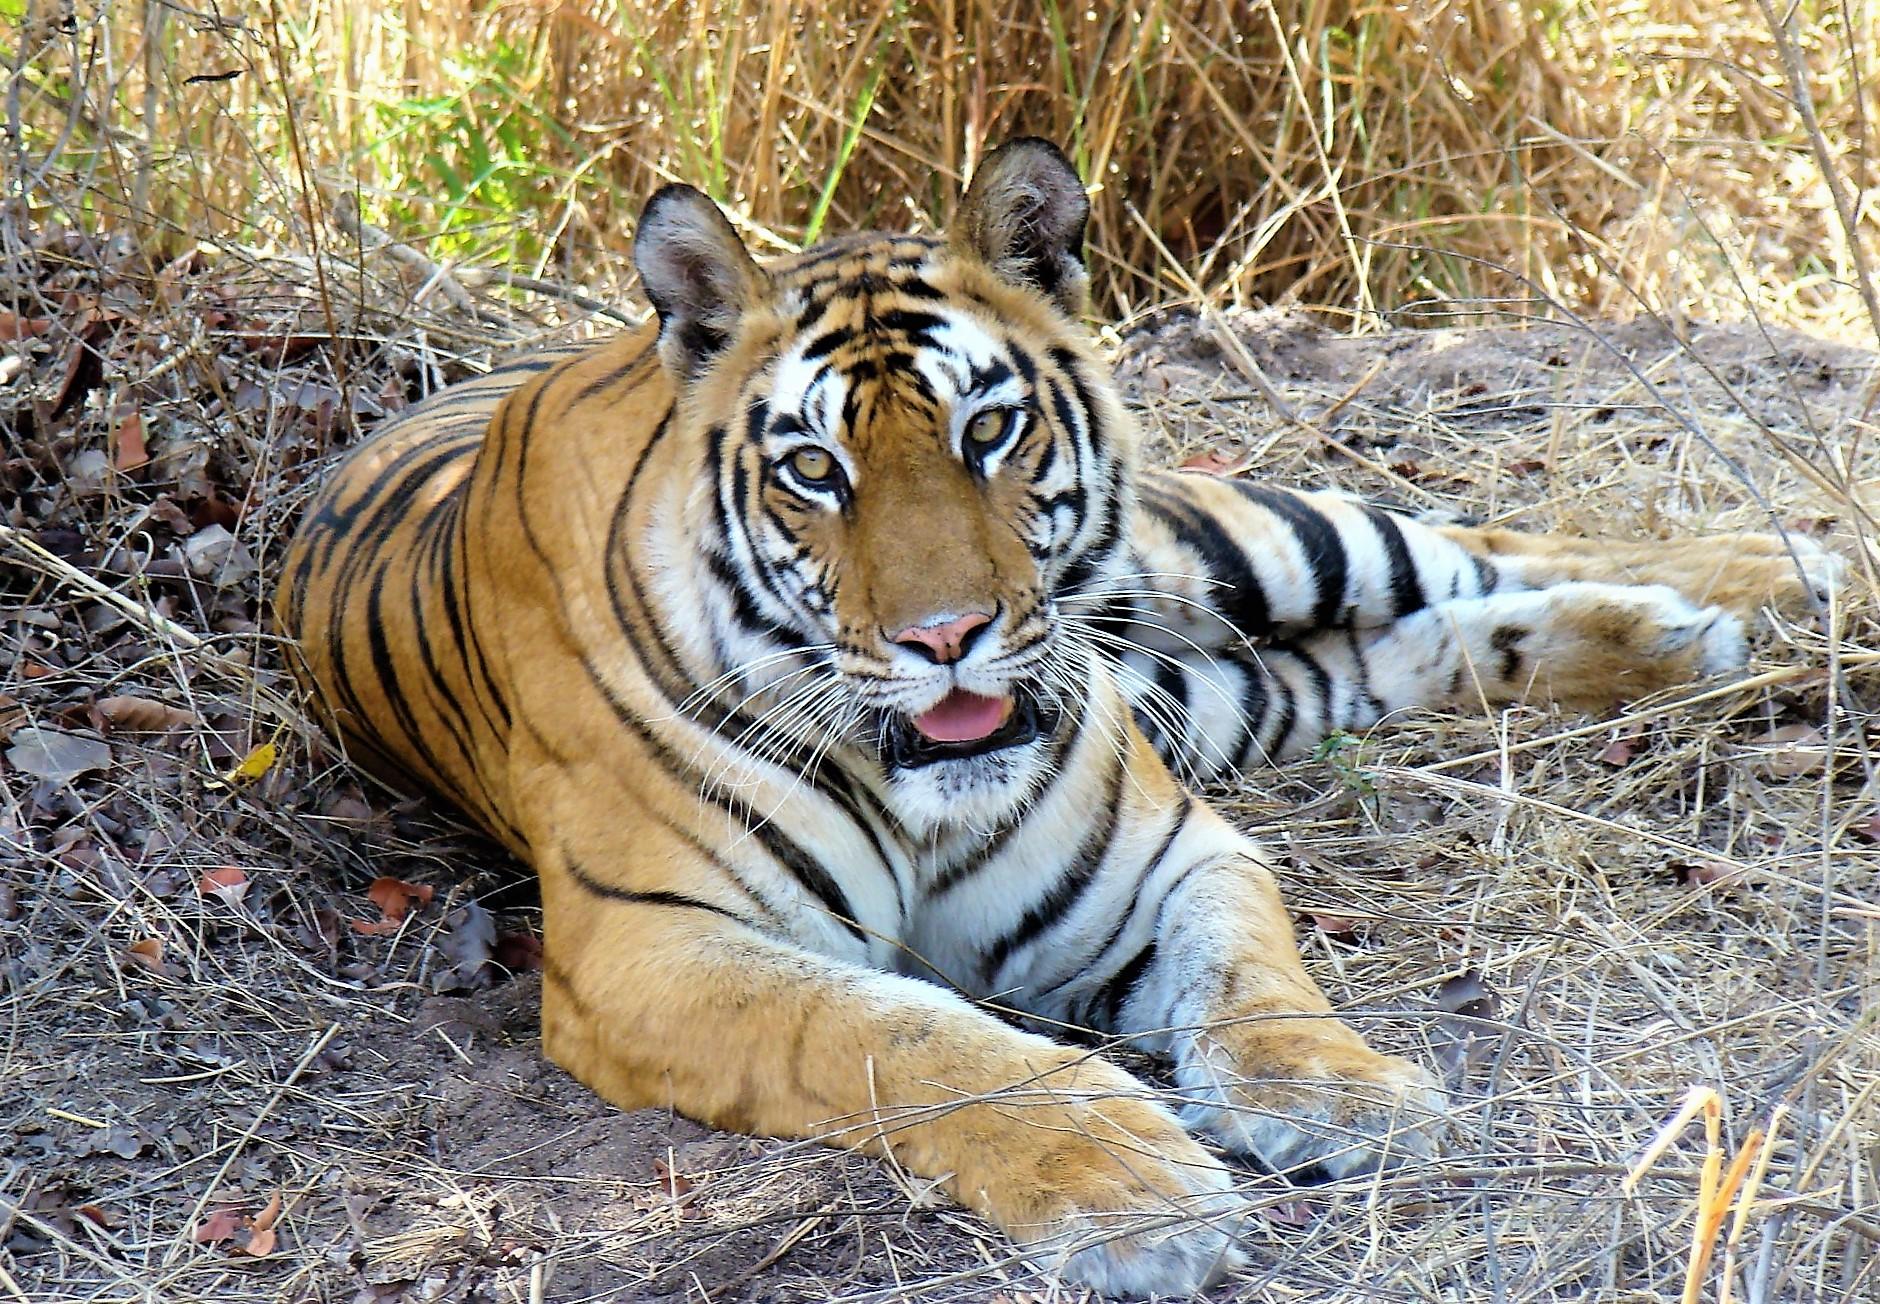 https://upload.wikimedia.org/wikipedia/commons/6/6b/Tigers_Of_Bandhavgarh%2C_truly_magnificent!.jpg